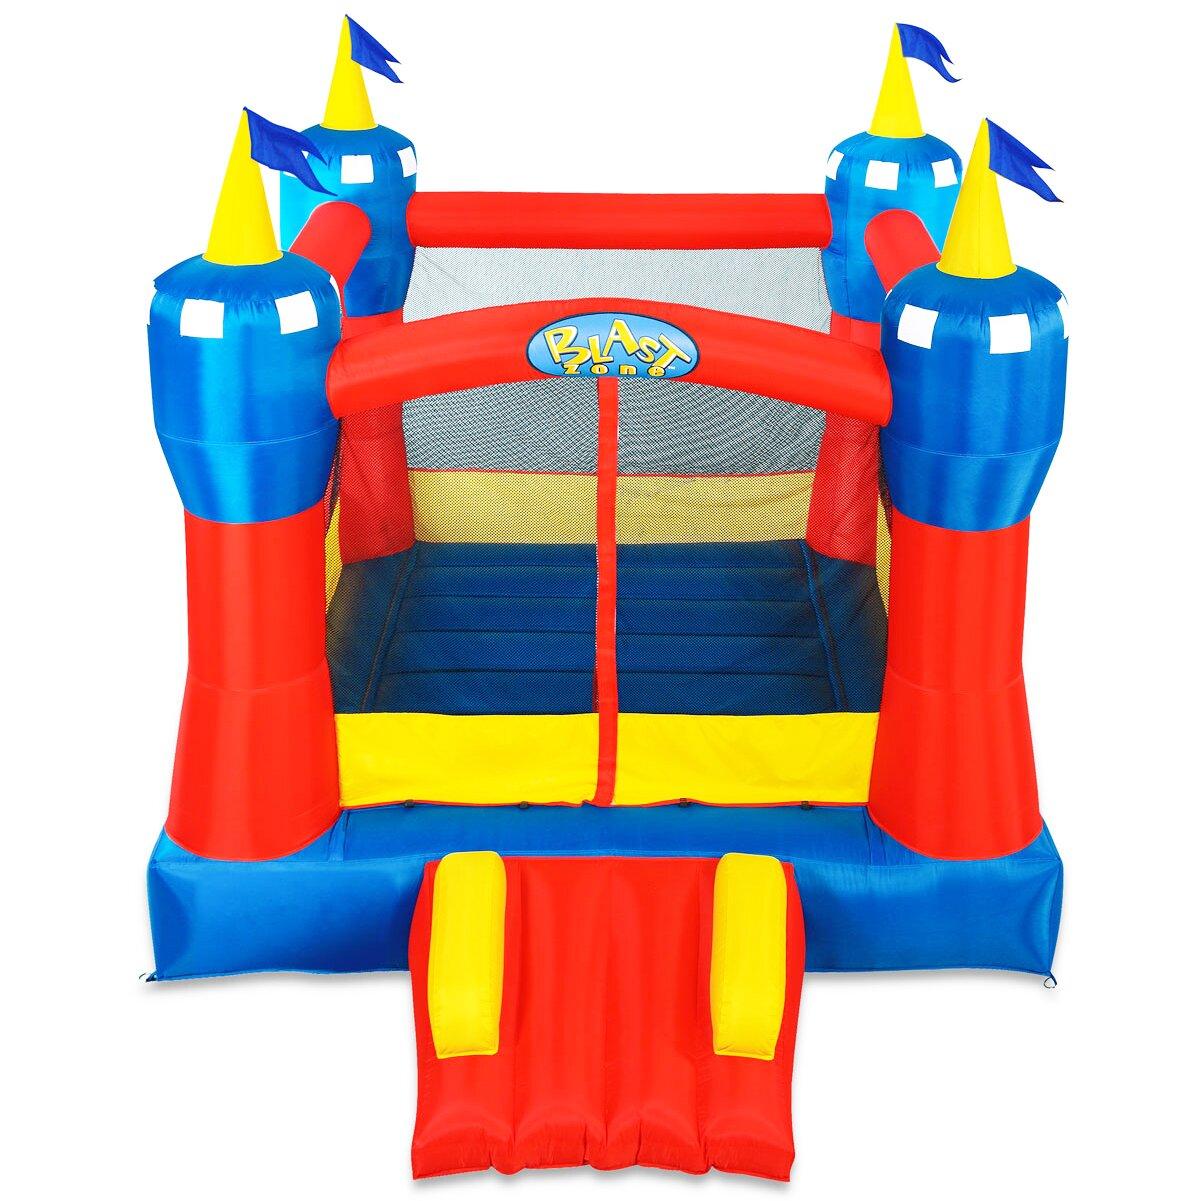 Blast zone magic castle bounce house reviews wayfair for Blast zone magic castle inflatable bounce house